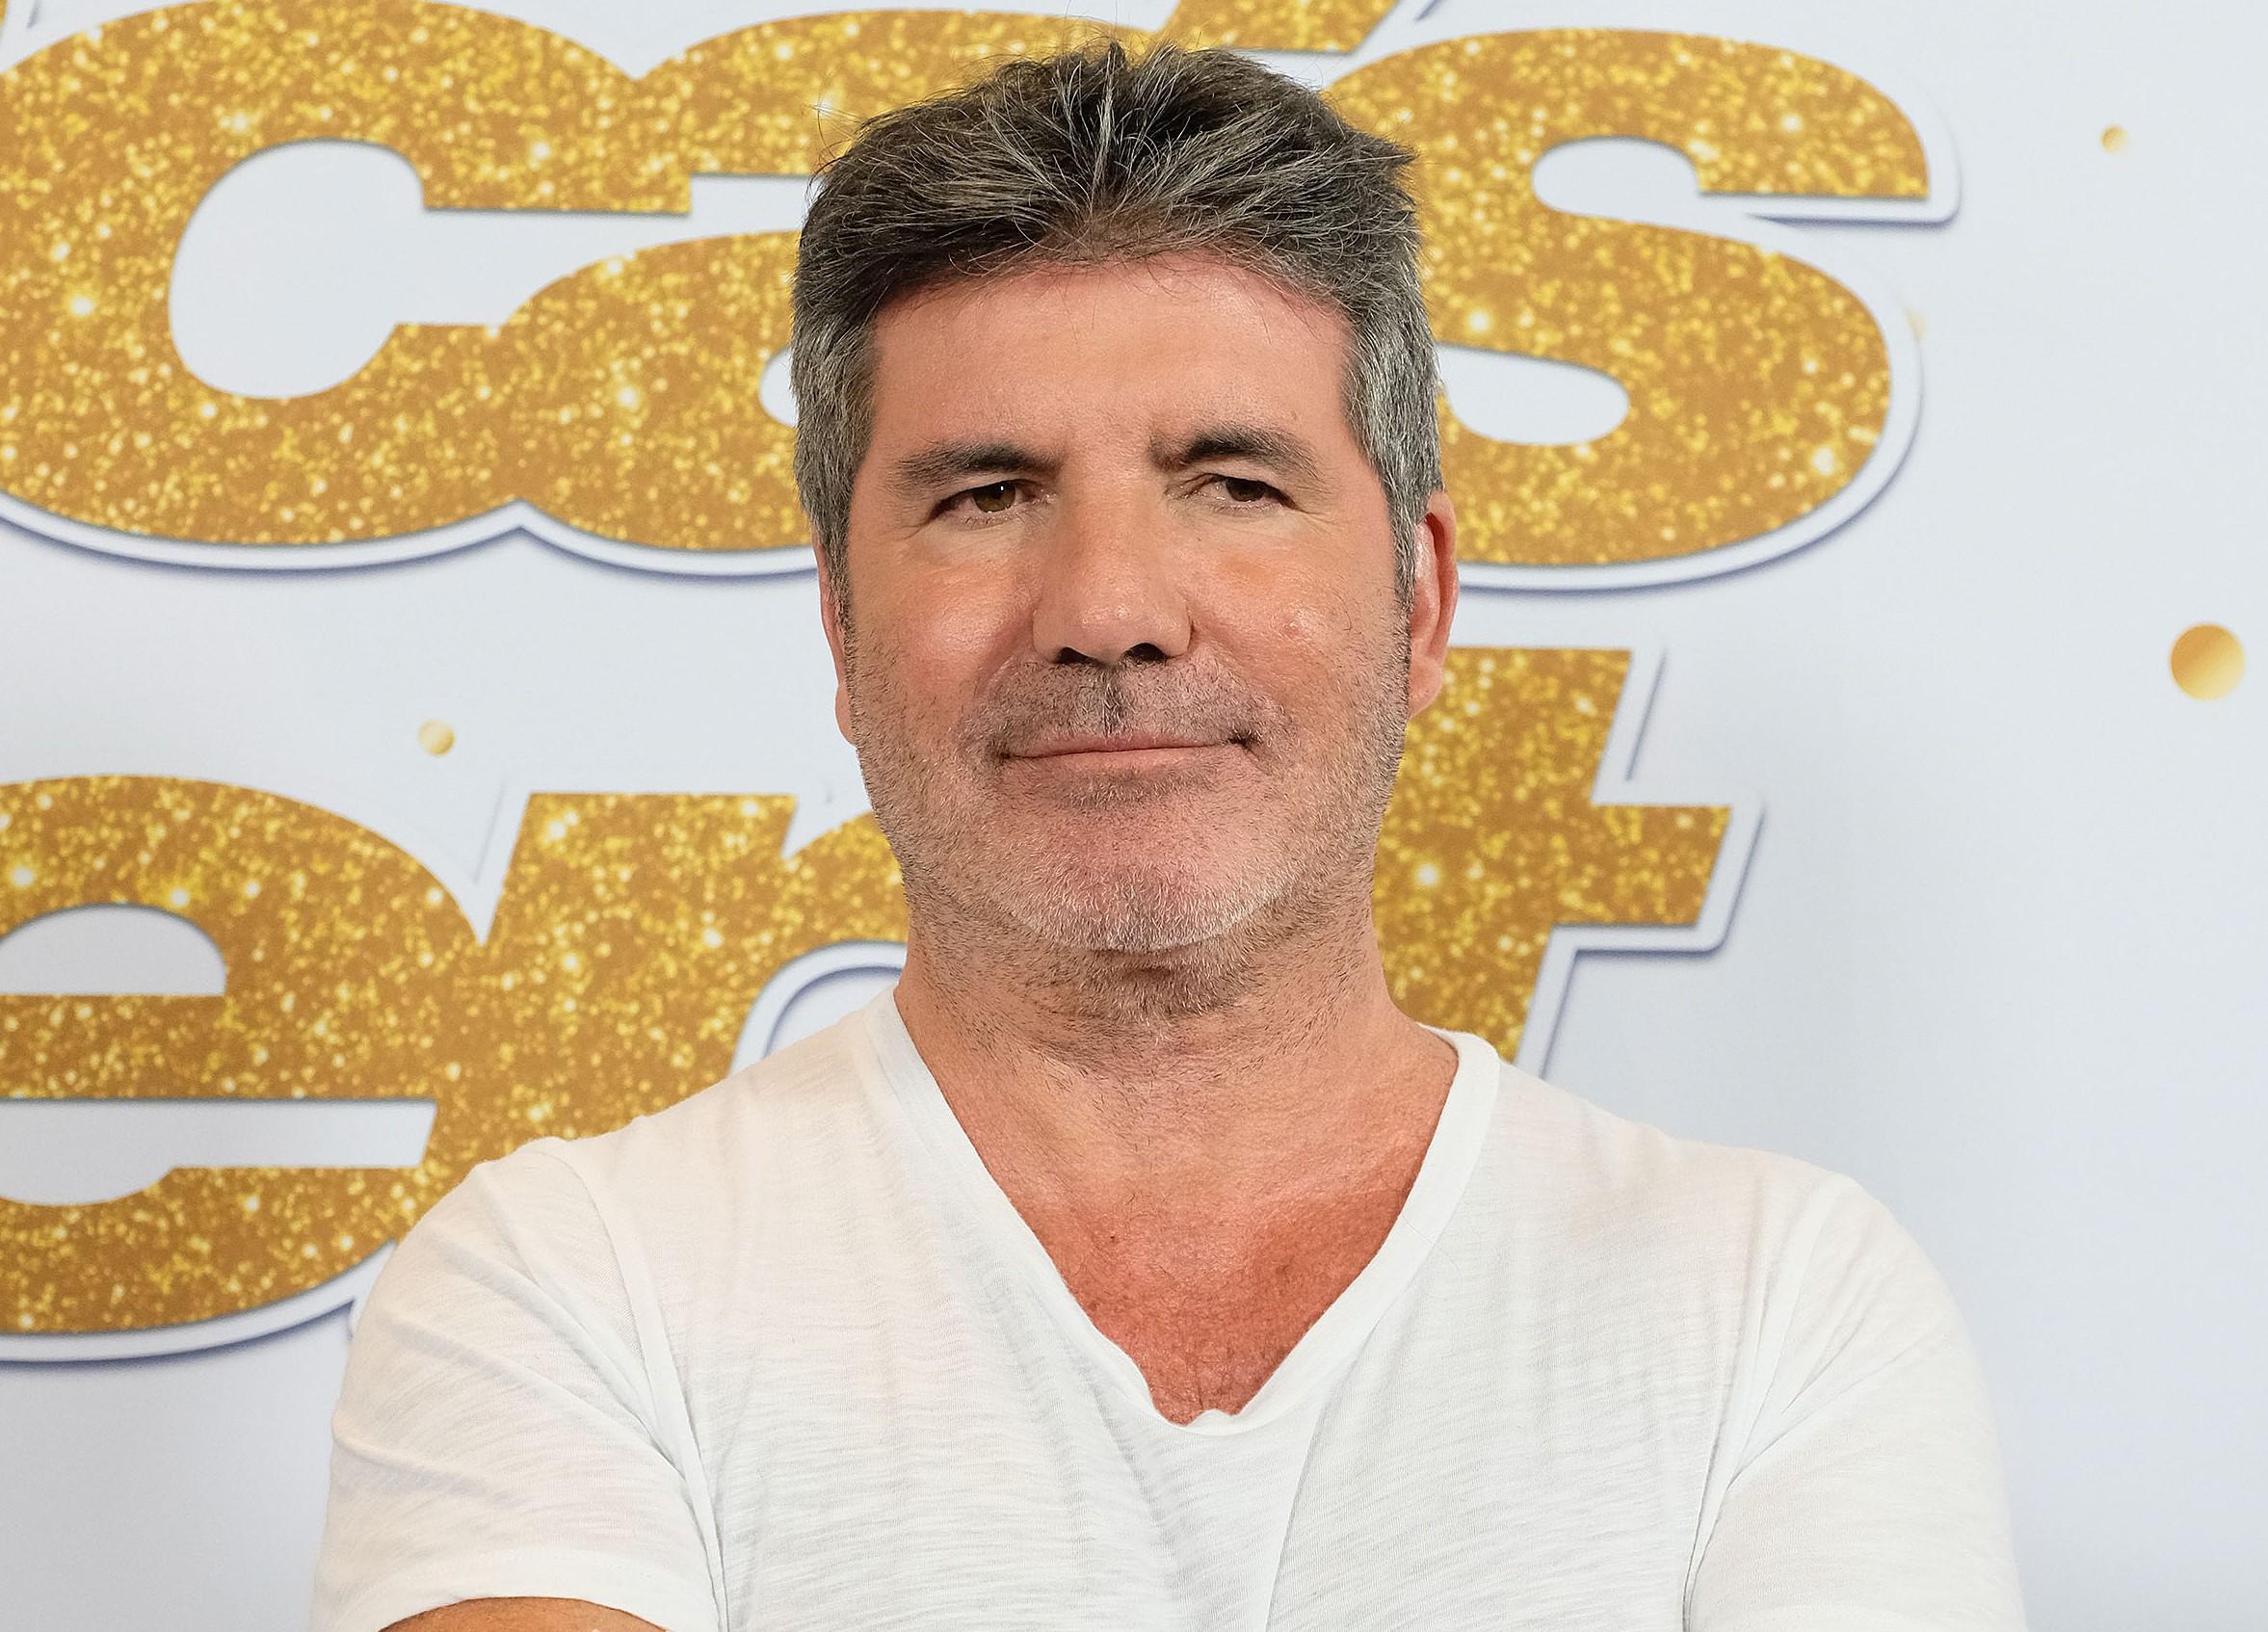 Simon Cowell's £3million Celebrity X Factor plan revealed